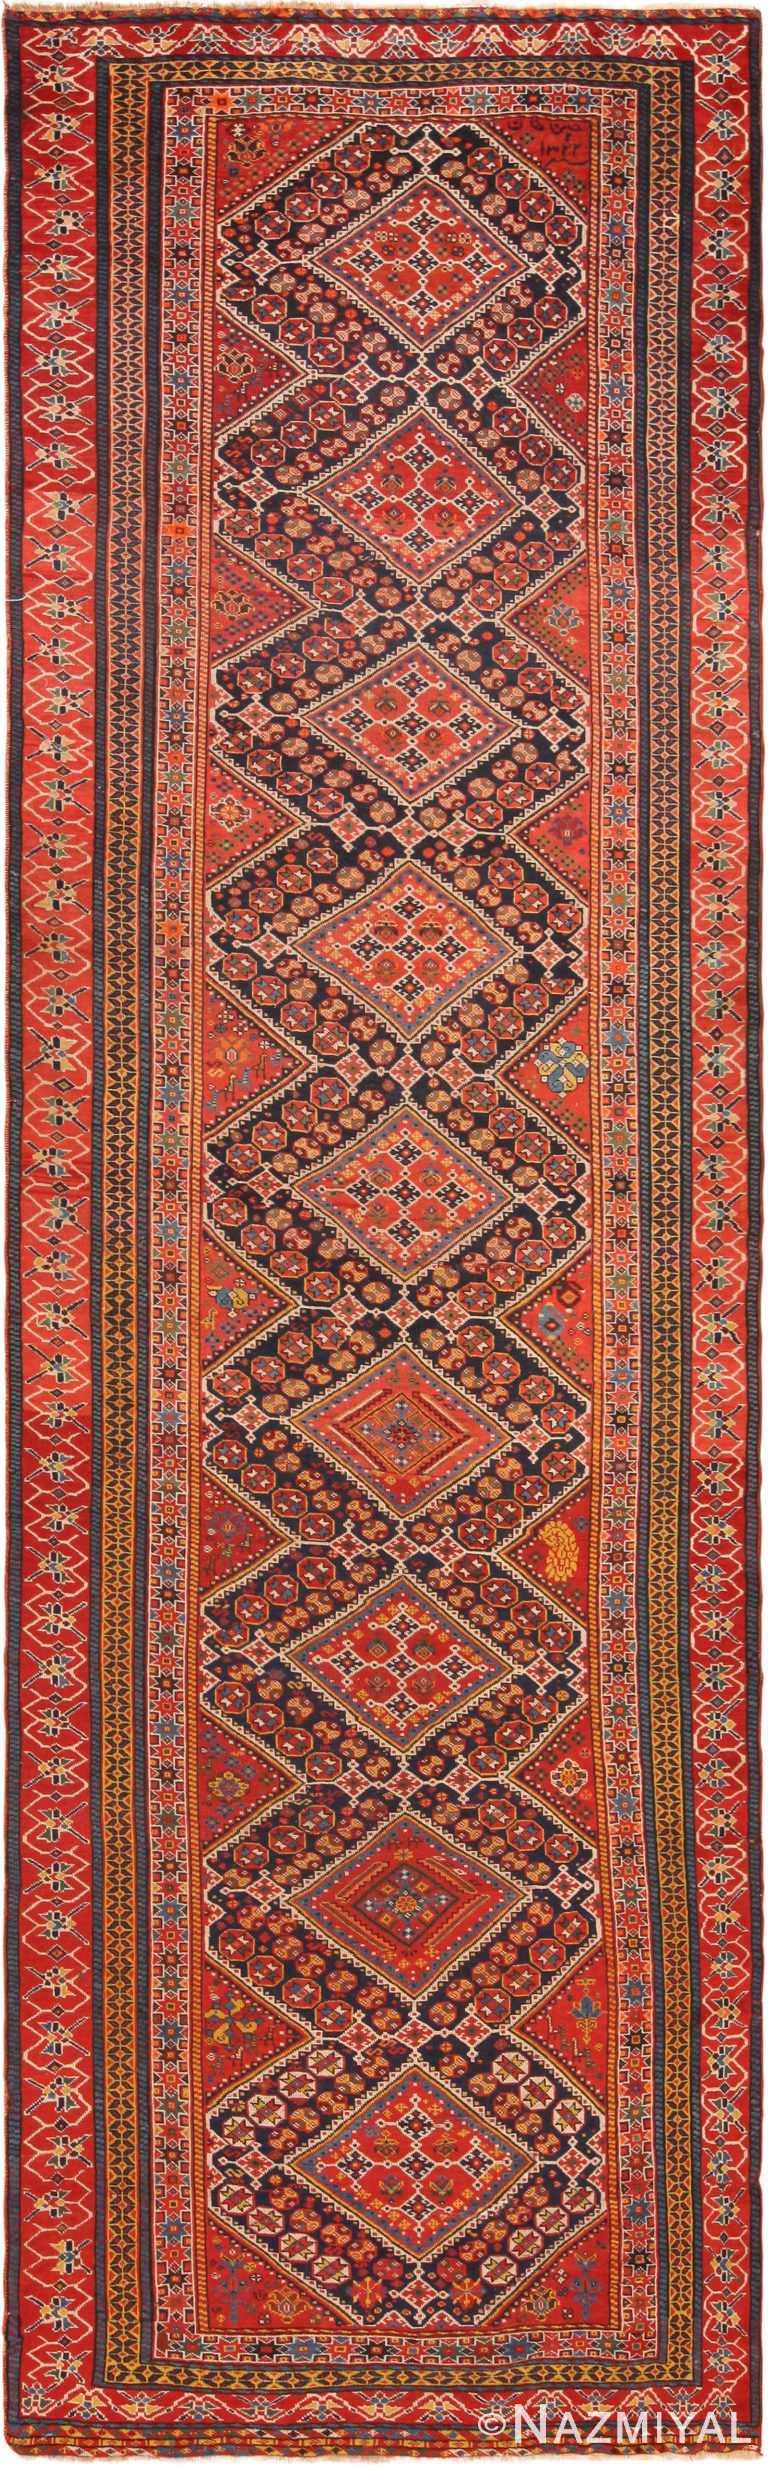 Antique Persian Qashqai Runner Rug 71098 by Nazmiyal Antique Rugs